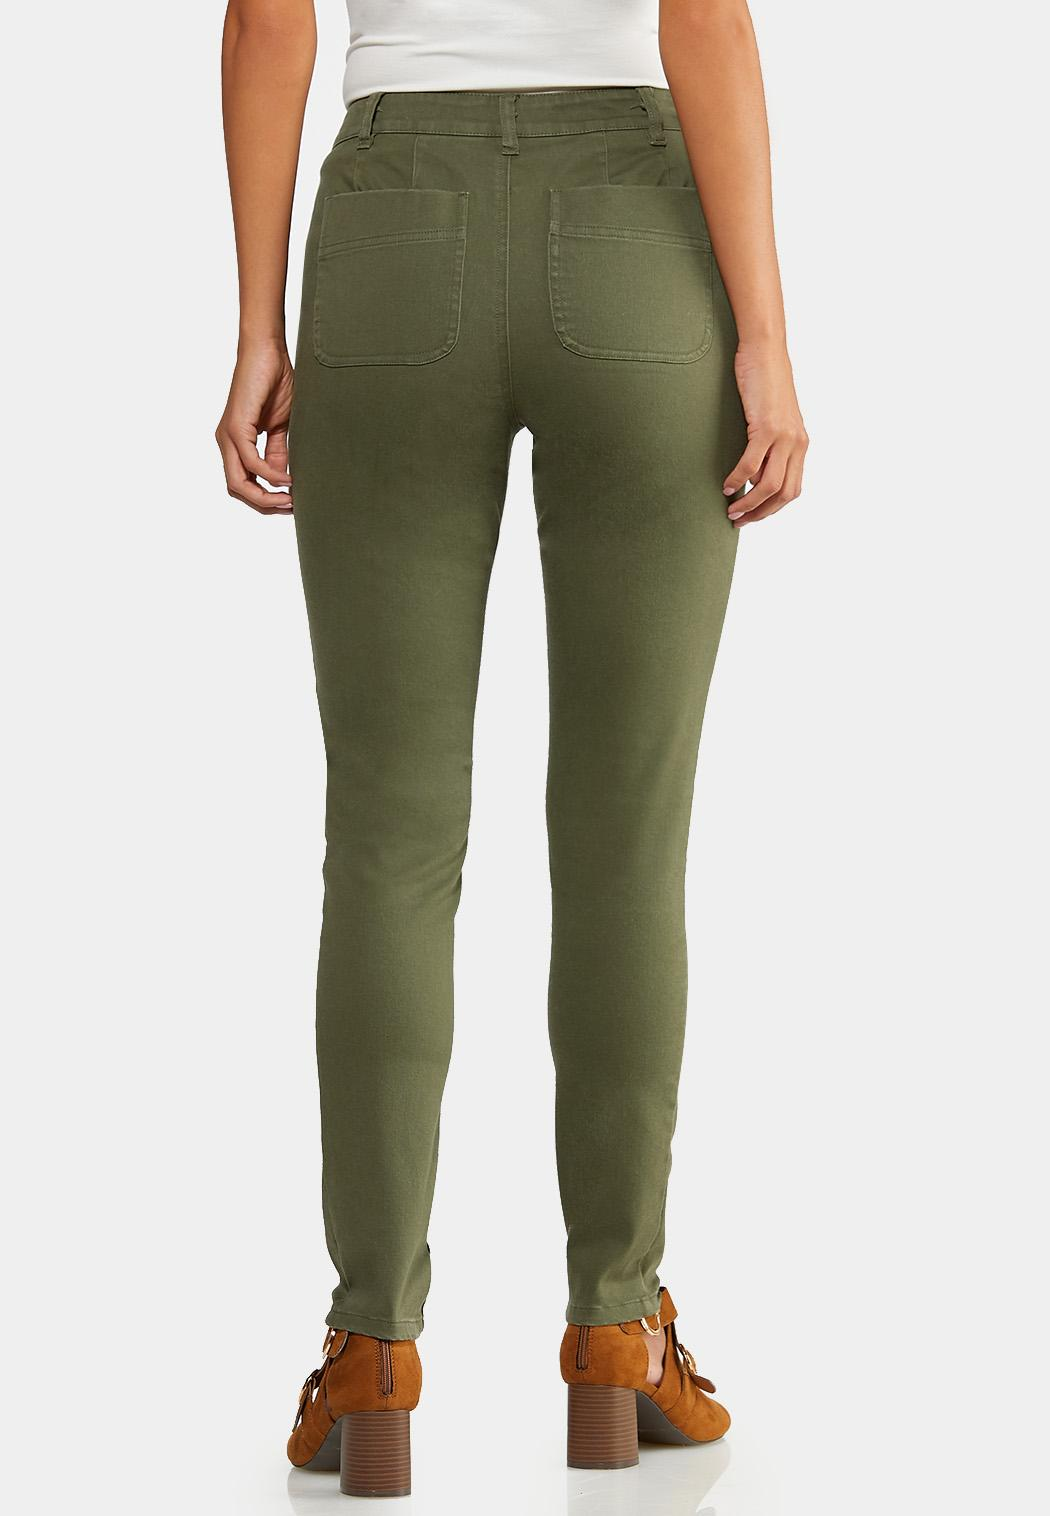 Petite Olive Utility Jeans (Item #43933168)